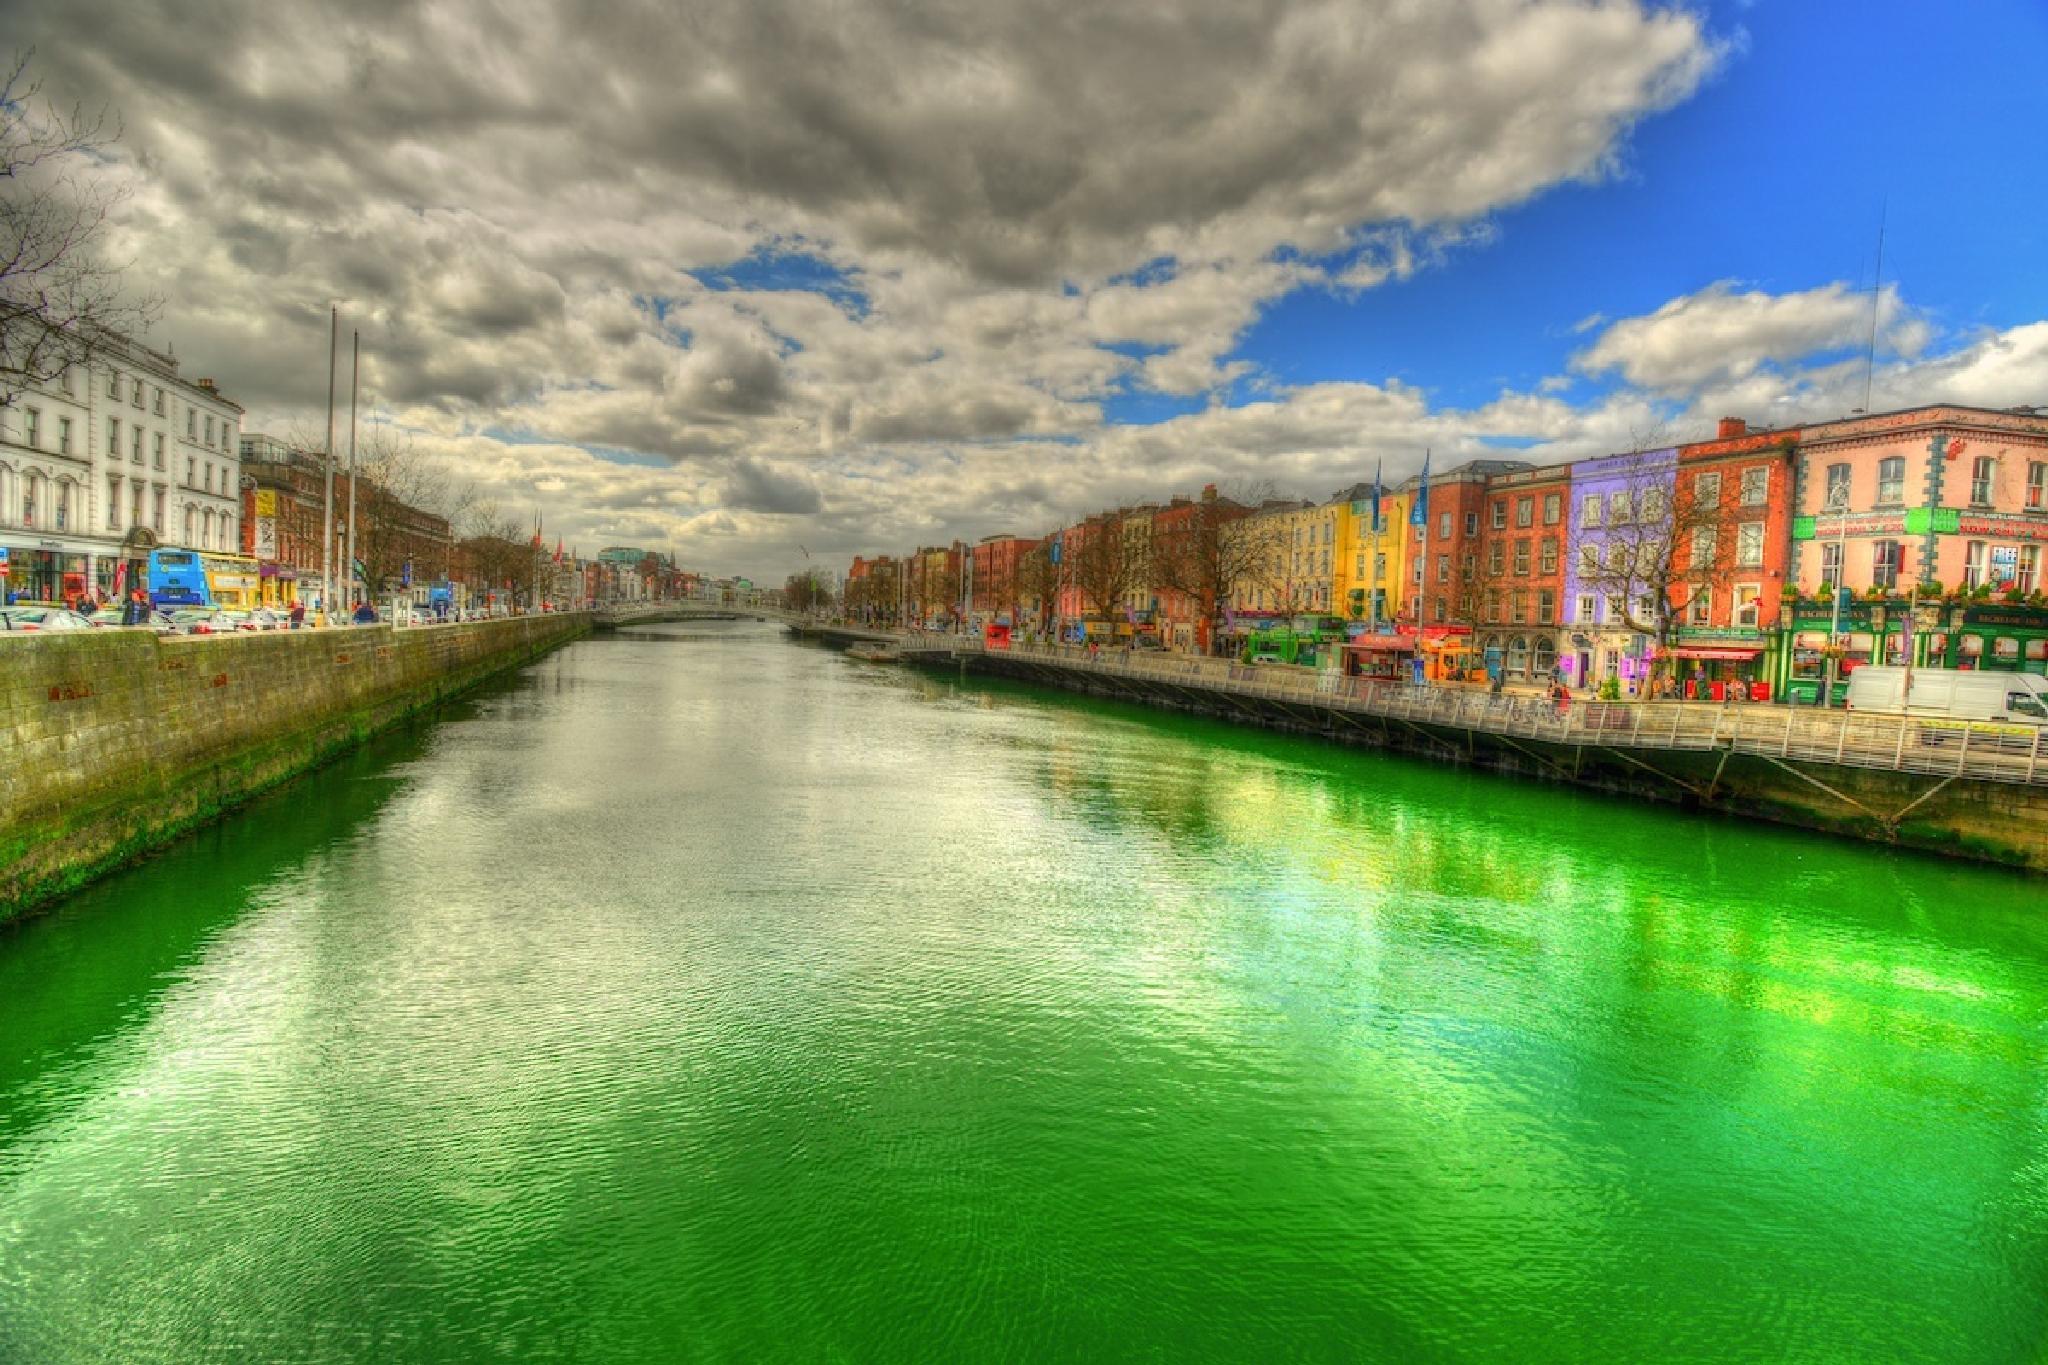 River Liffey Dublin Ireland by Rob Richardson